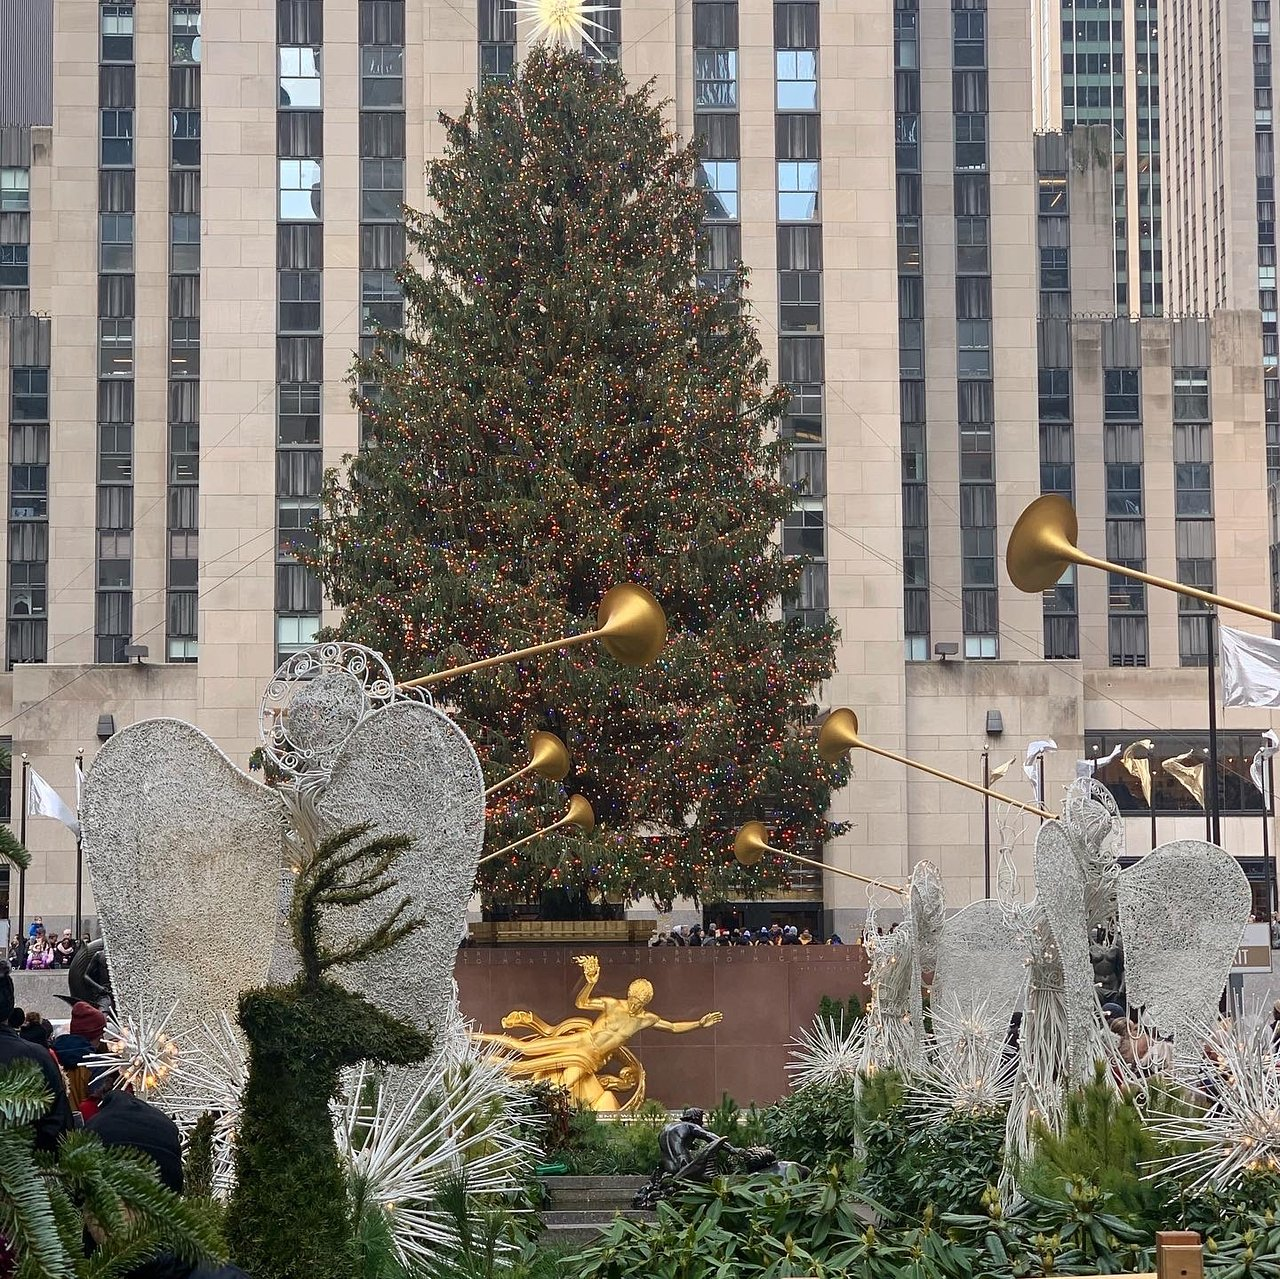 Kennedy Plaza Christmas Tree Lighting 2021 Rockefeller Plaza Manhattan New York City 2021 What To Know Before You Go With Photos Tripadvisor